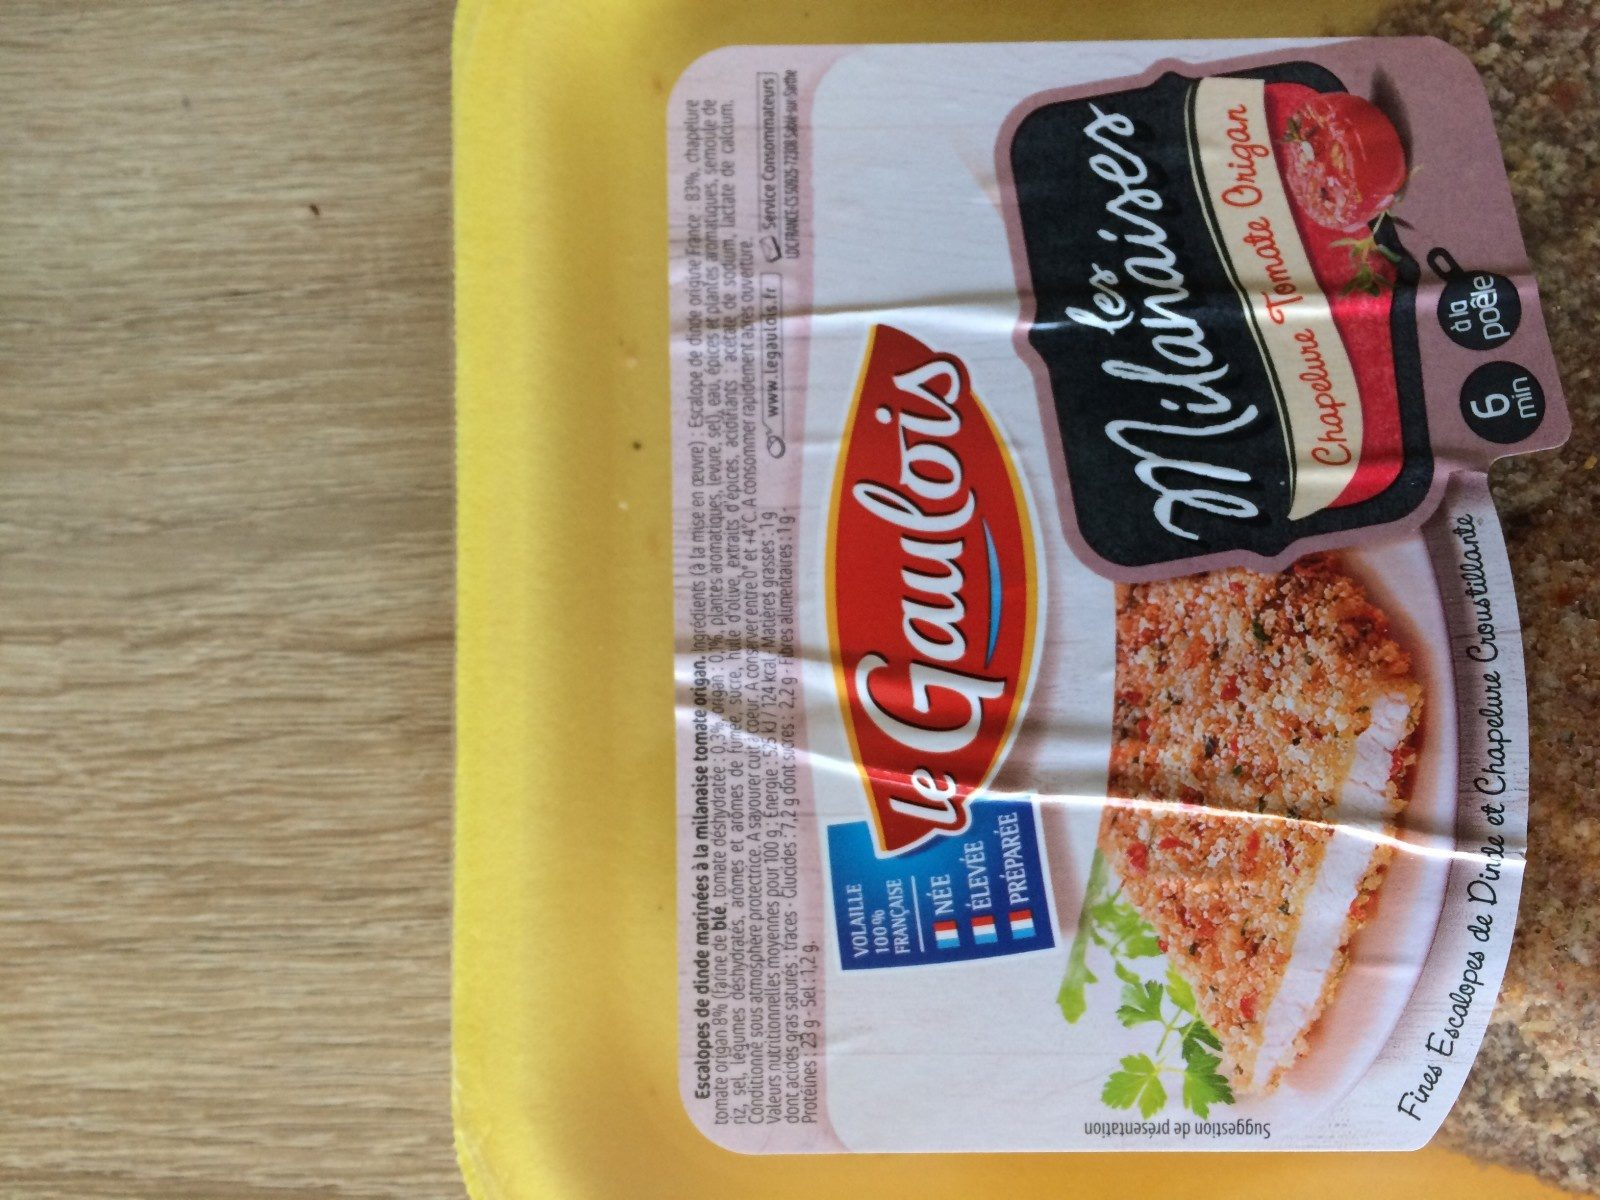 Les milanaises chapelure tomate origan - Ingrediënten